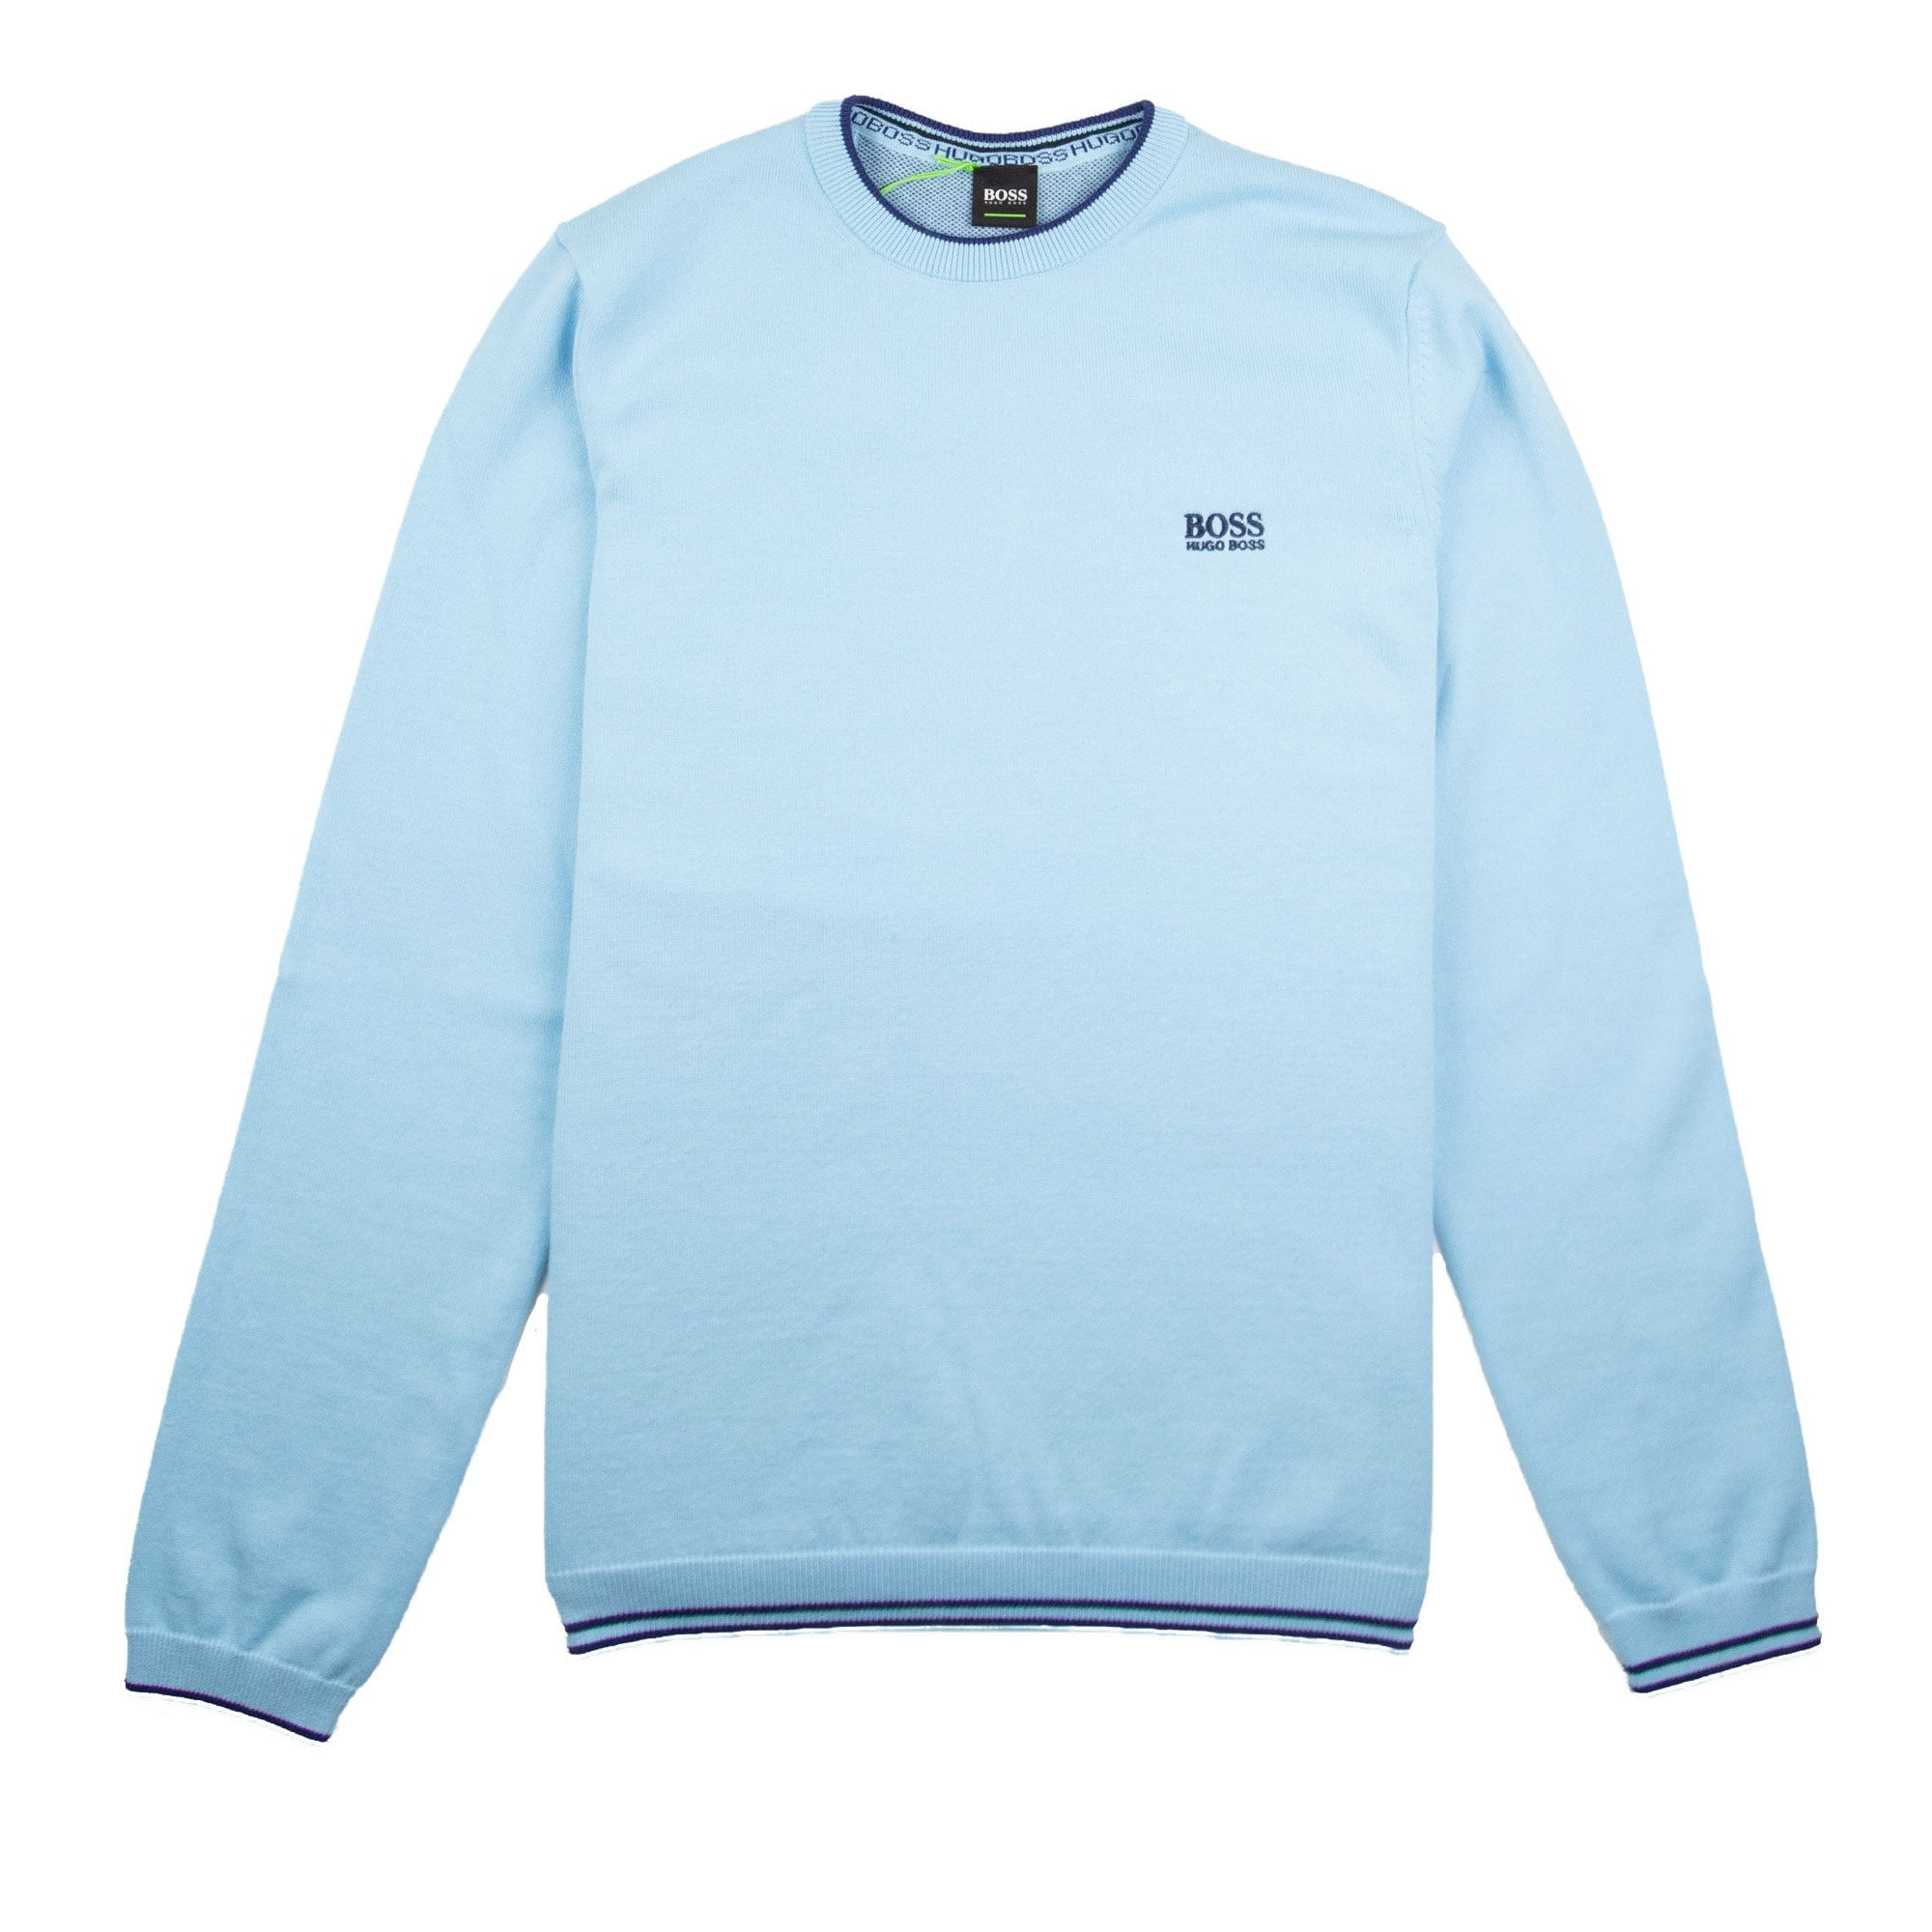 junior hugo boss sweatshirt